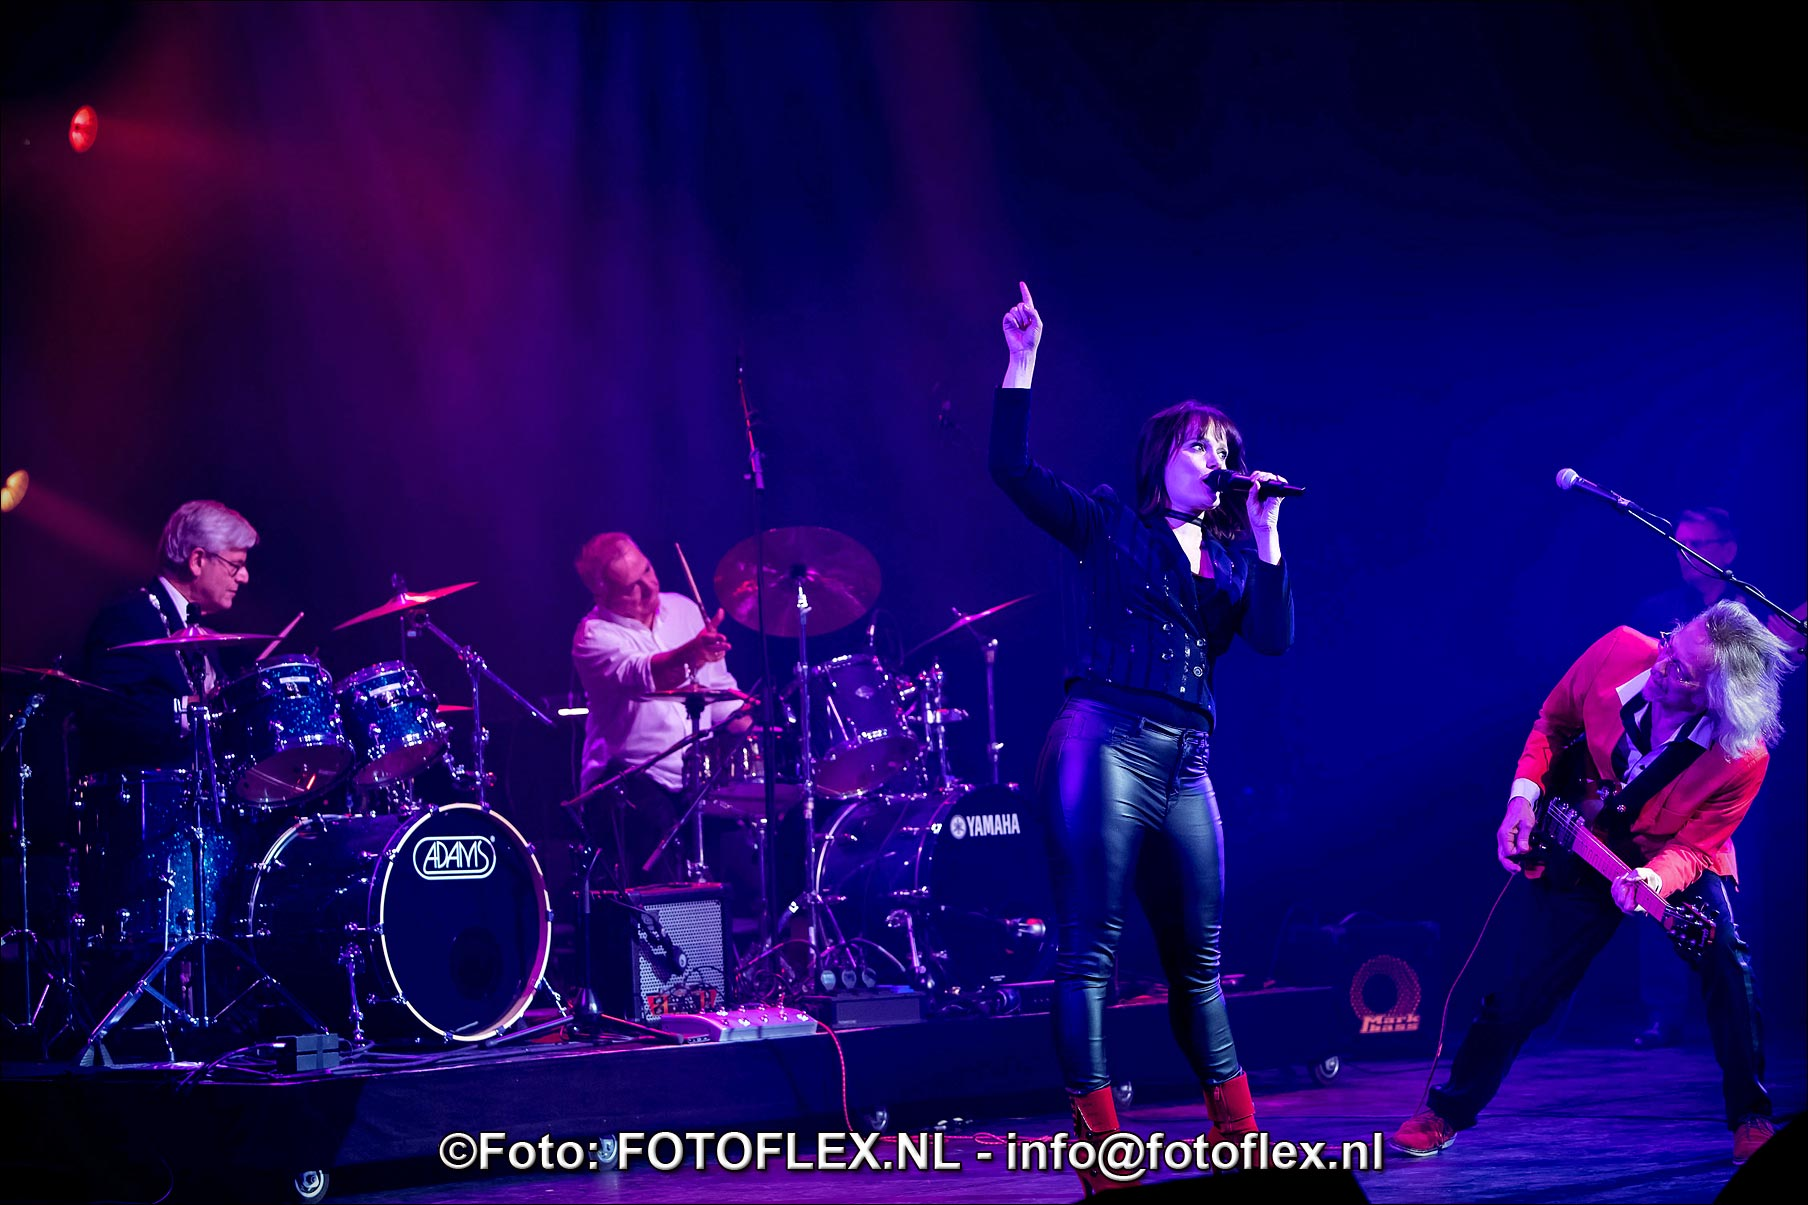 0315-CopyrightFOTOFLEX.NL07012020